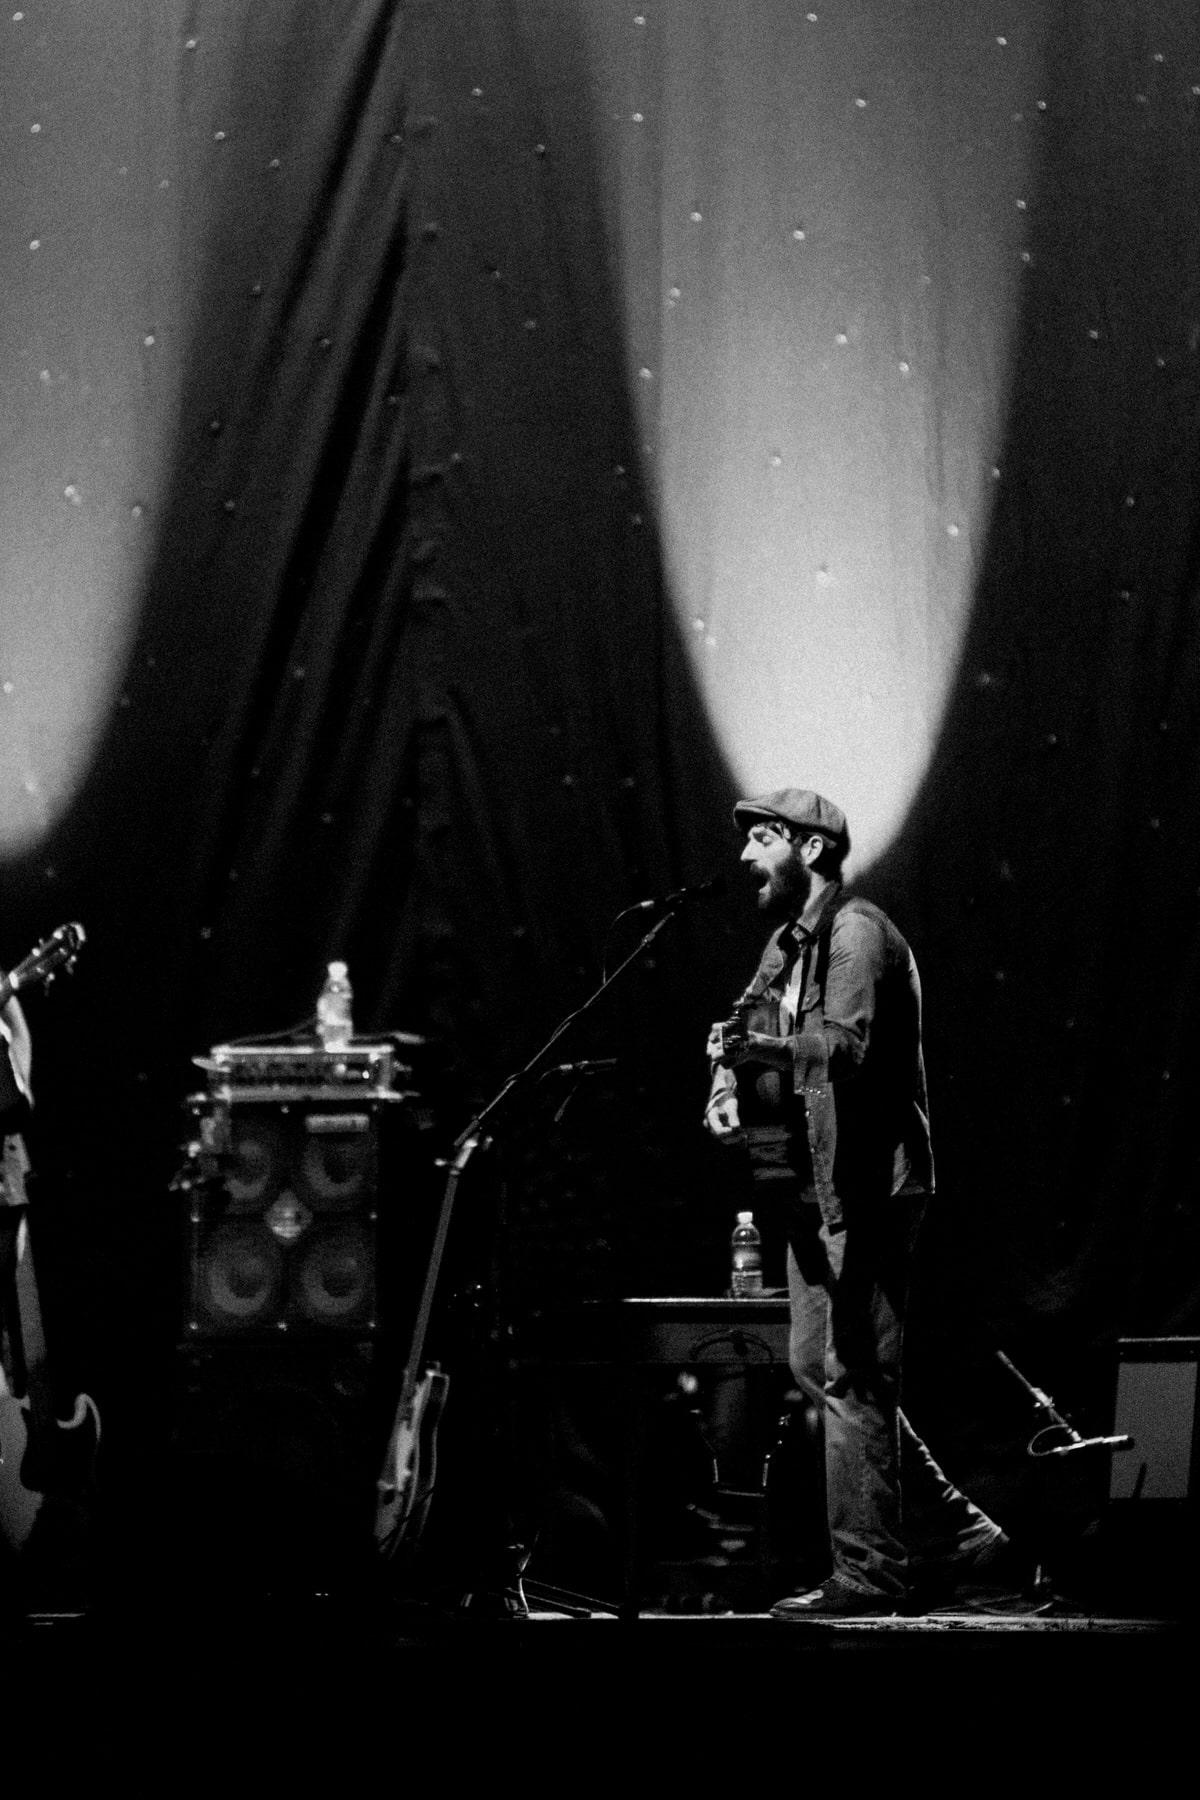 David-Gray-Ray-LaMontagne-concert-Jay-Pritzker-Paviilion-Chicago-Illinois-black-and-white-fine-art-photography-by-Studio-L-photographer-Laura-Schneider-_3616